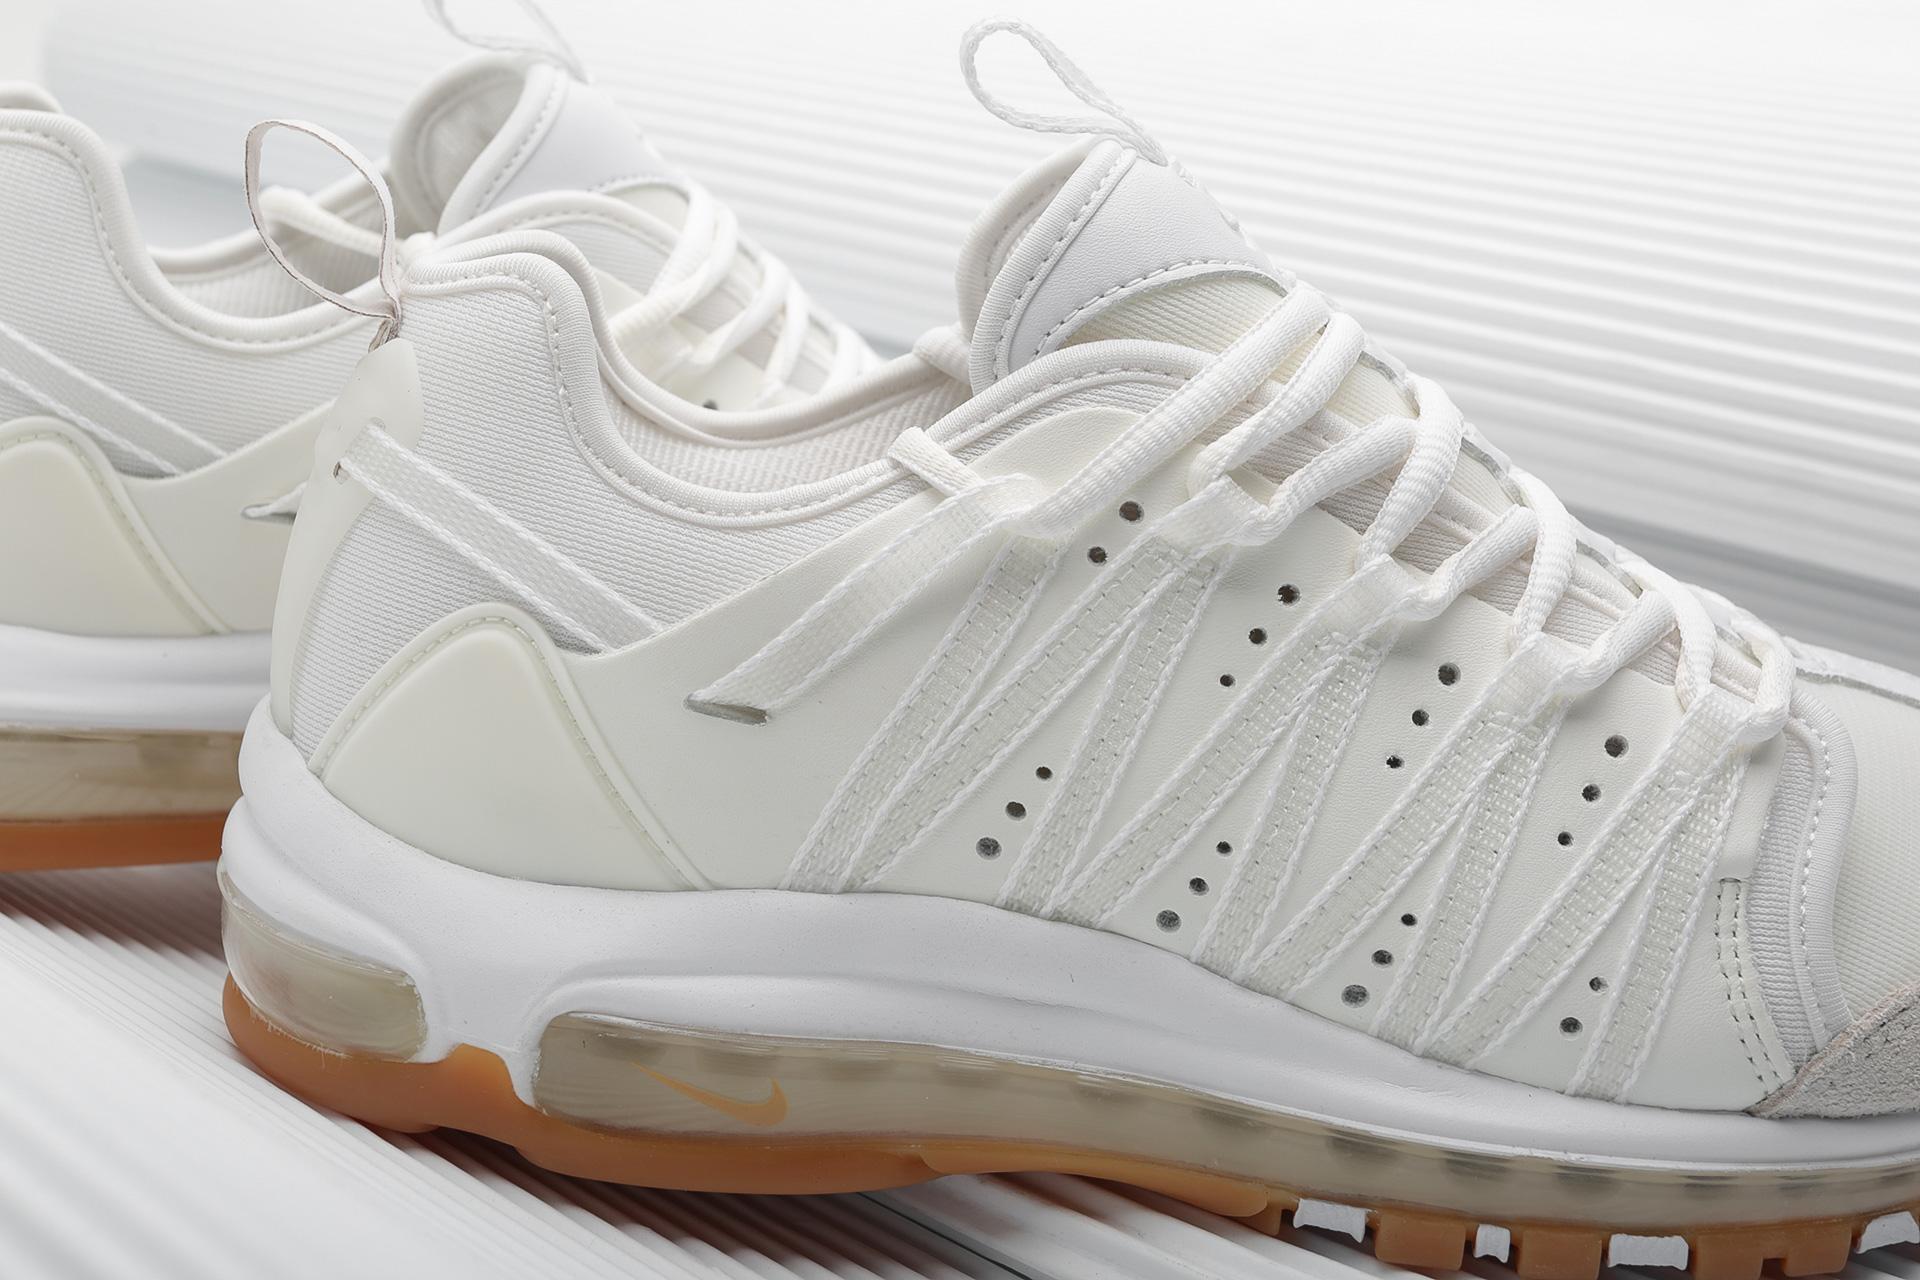 c34de6e2 ... Купить мужские белые кроссовки Nike Air Max 97 / Haven / Clot - фото 2  картинки ...